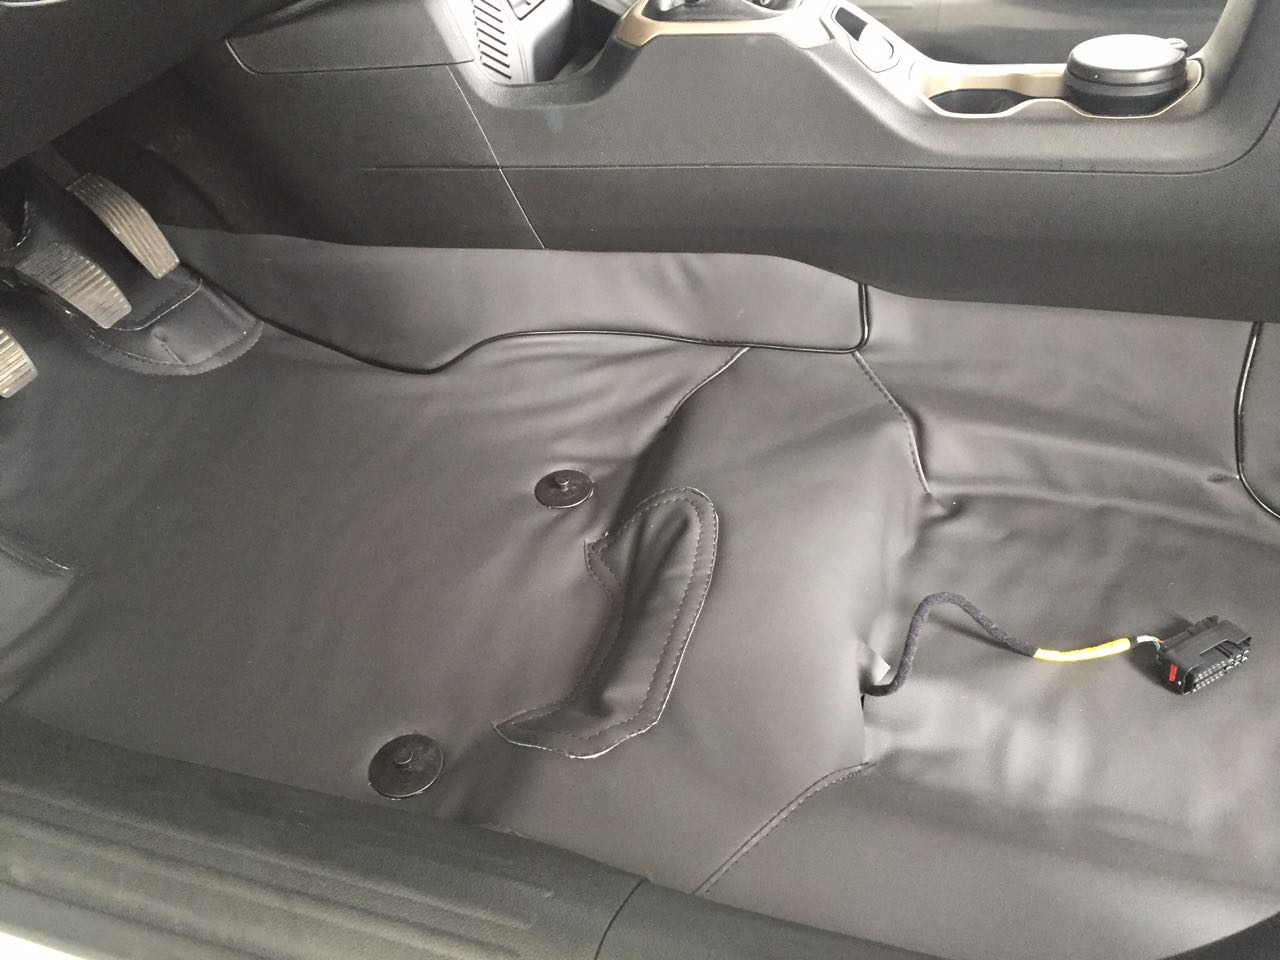 tapete Super Luxo Automotivo Assoalho renault Duster ate 2021